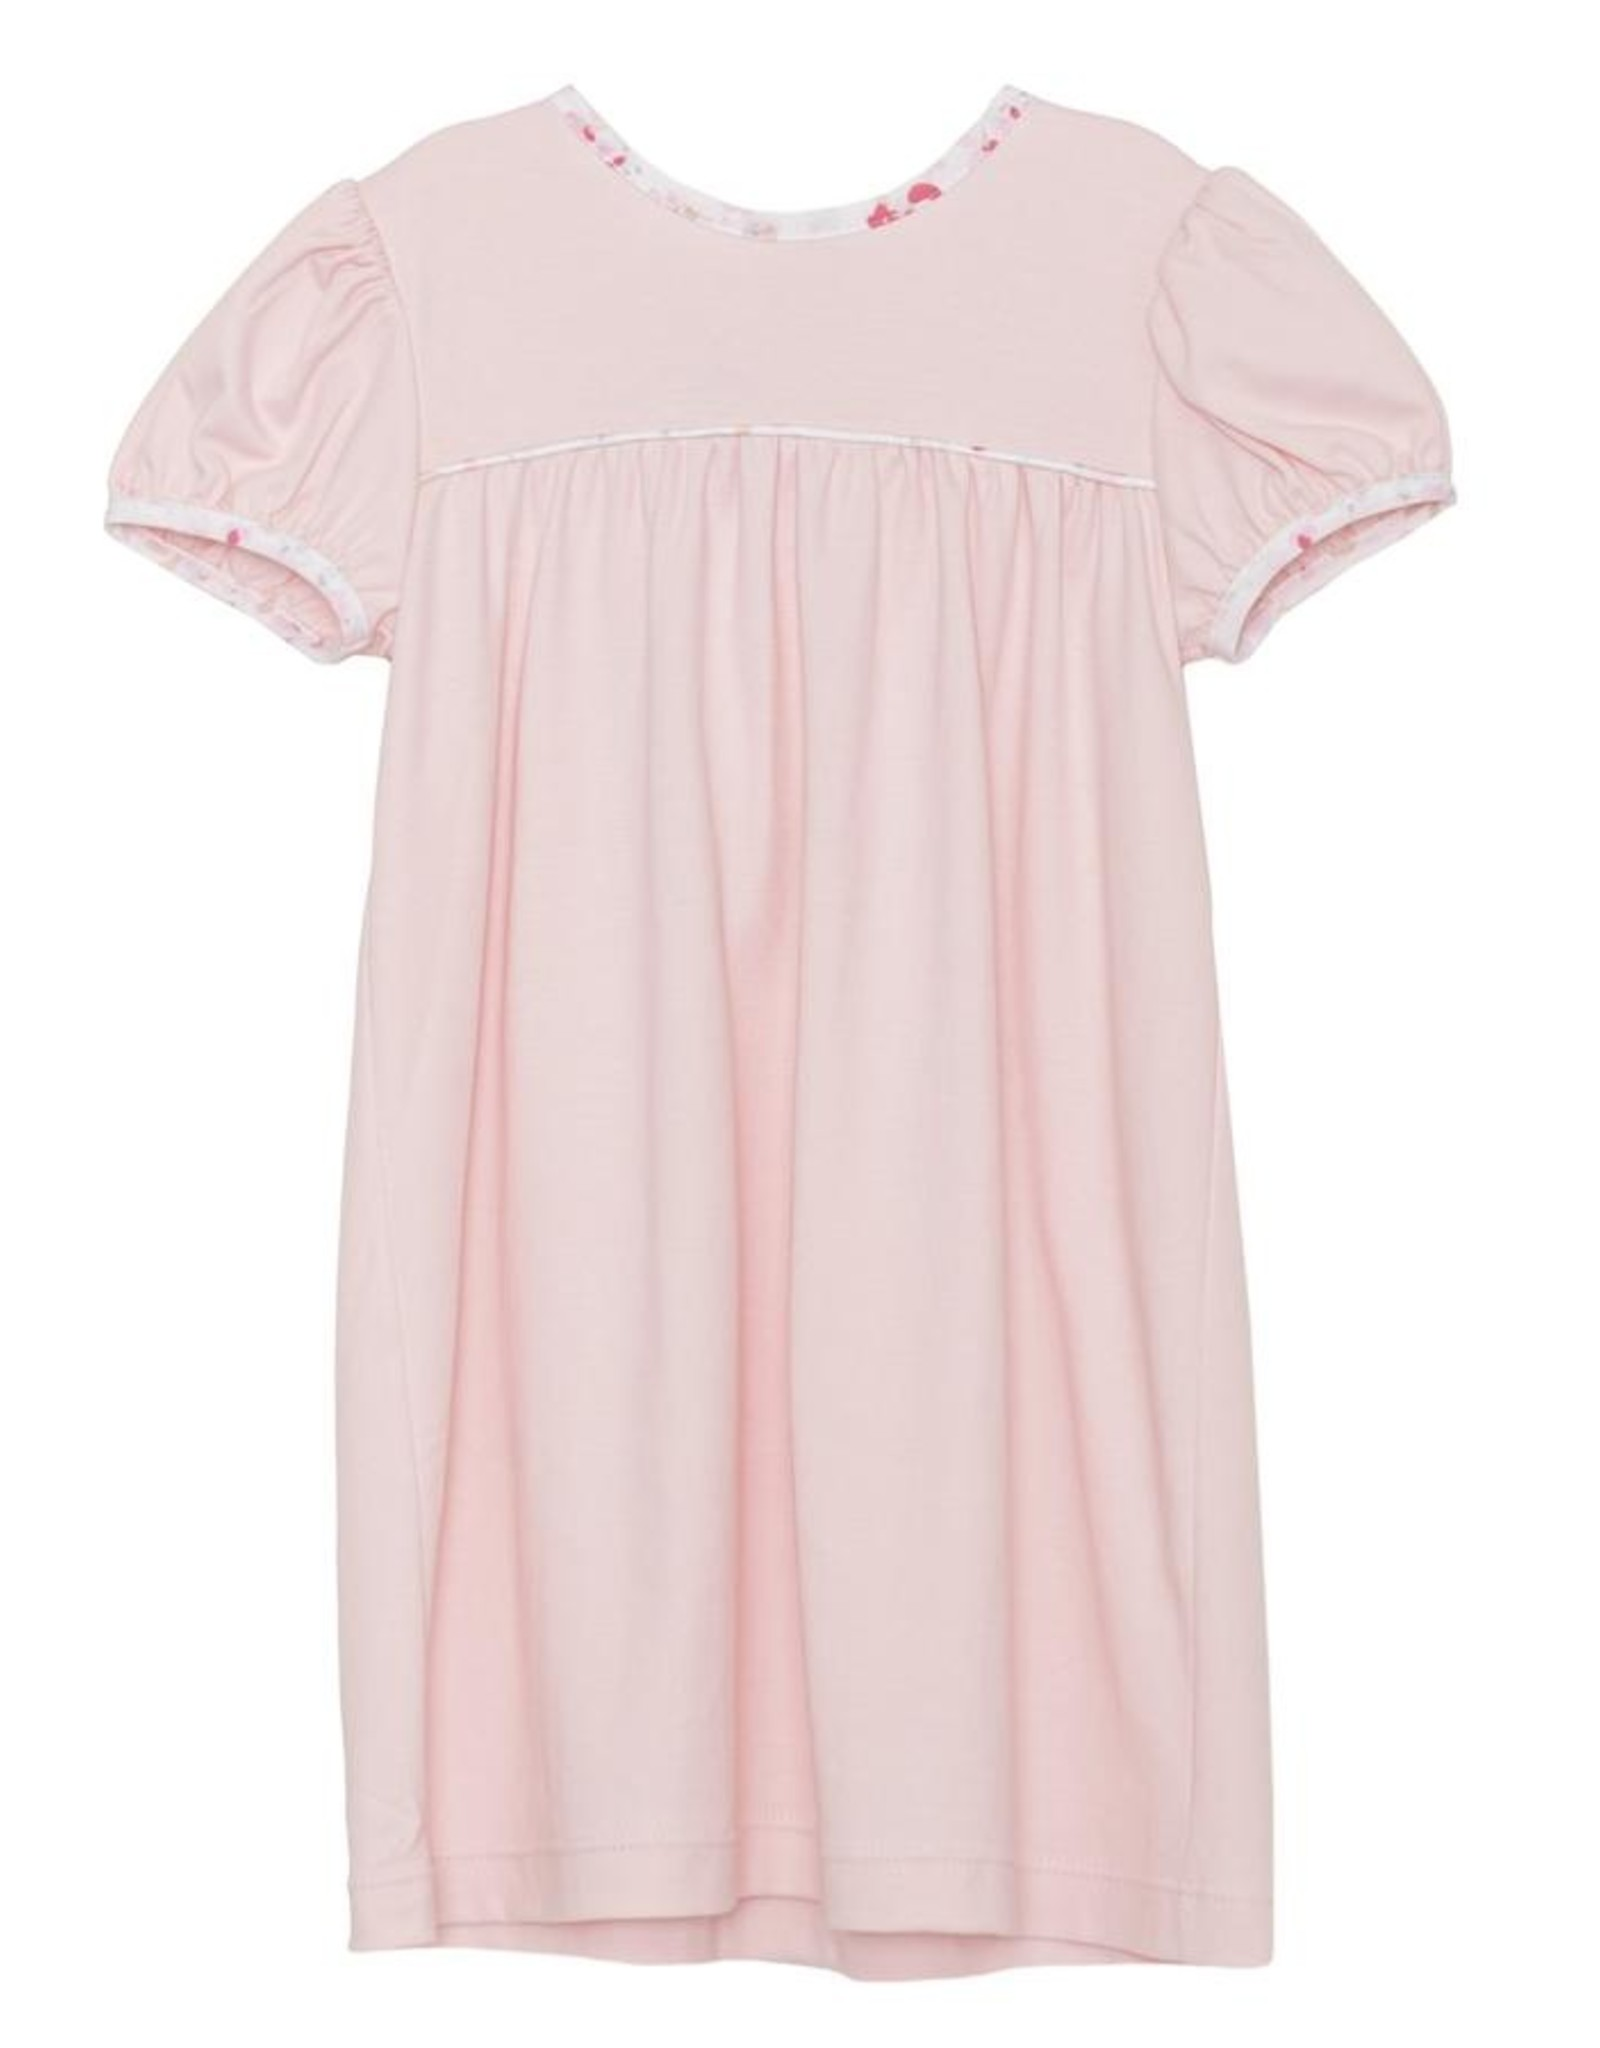 LullabySet Mother May I Dress- Light Pink Pima